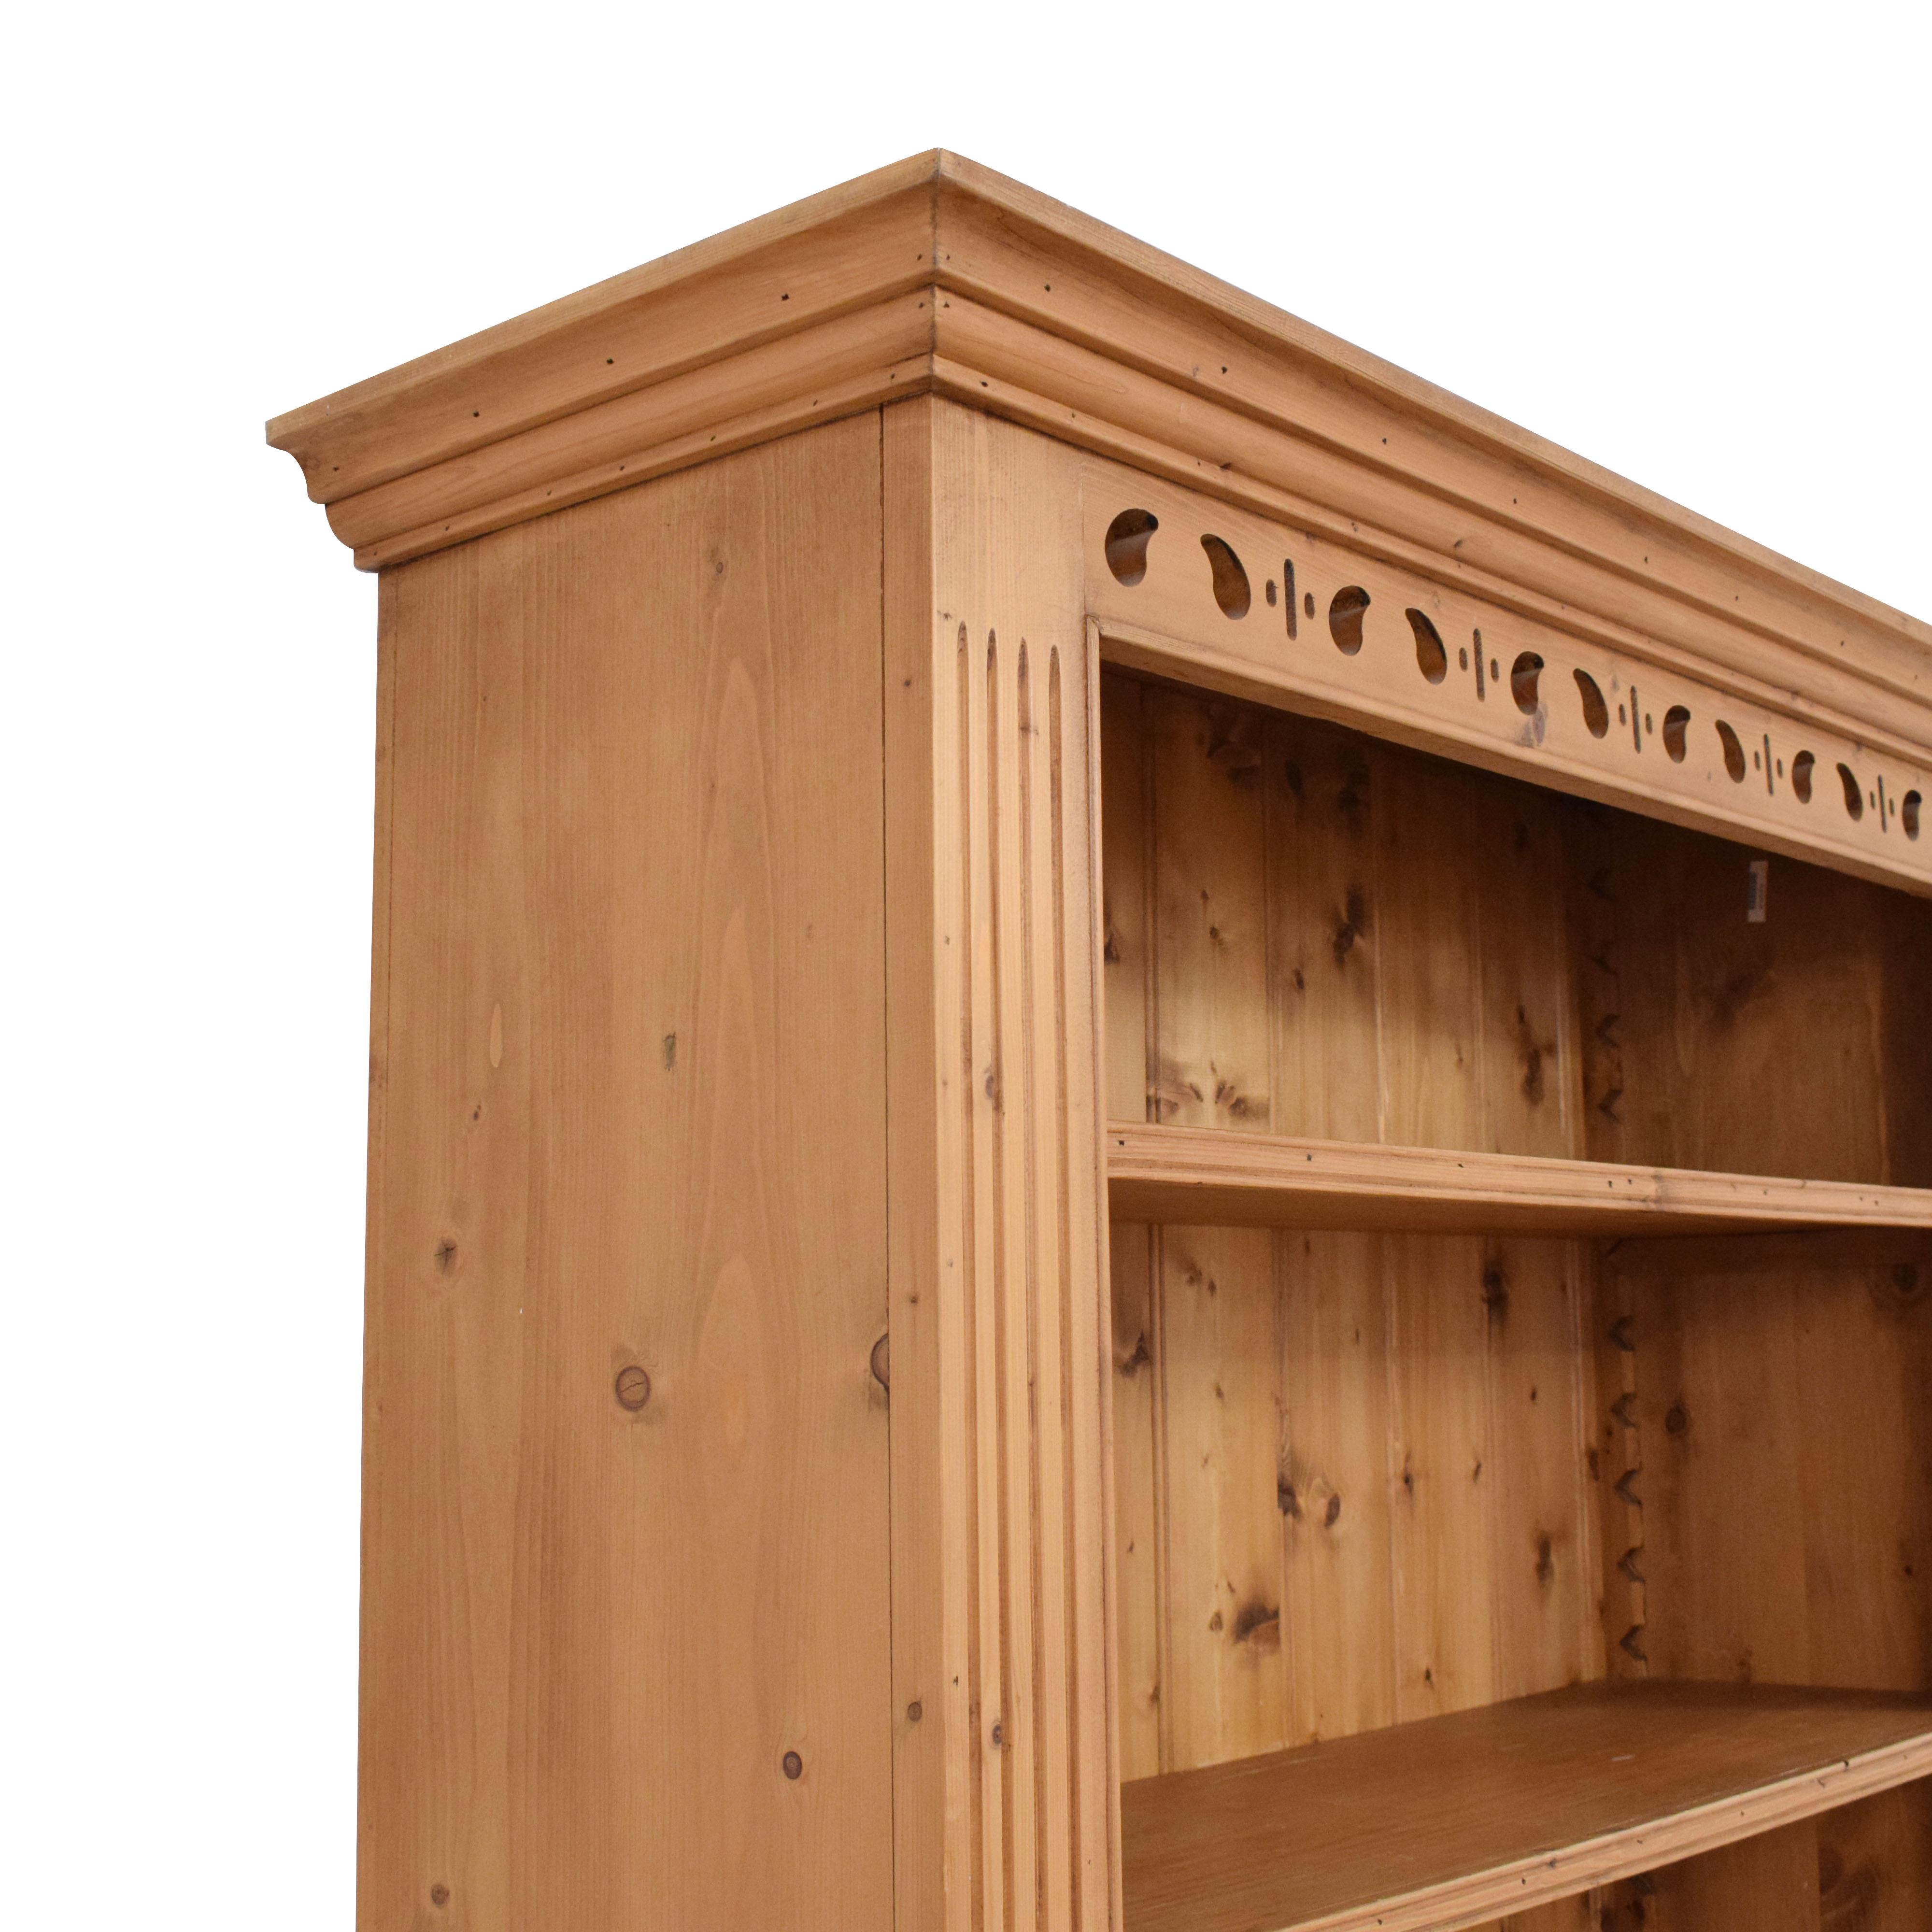 ABC Carpet & Home ABC Carpet & Home Bookshelf Cabinet Storage